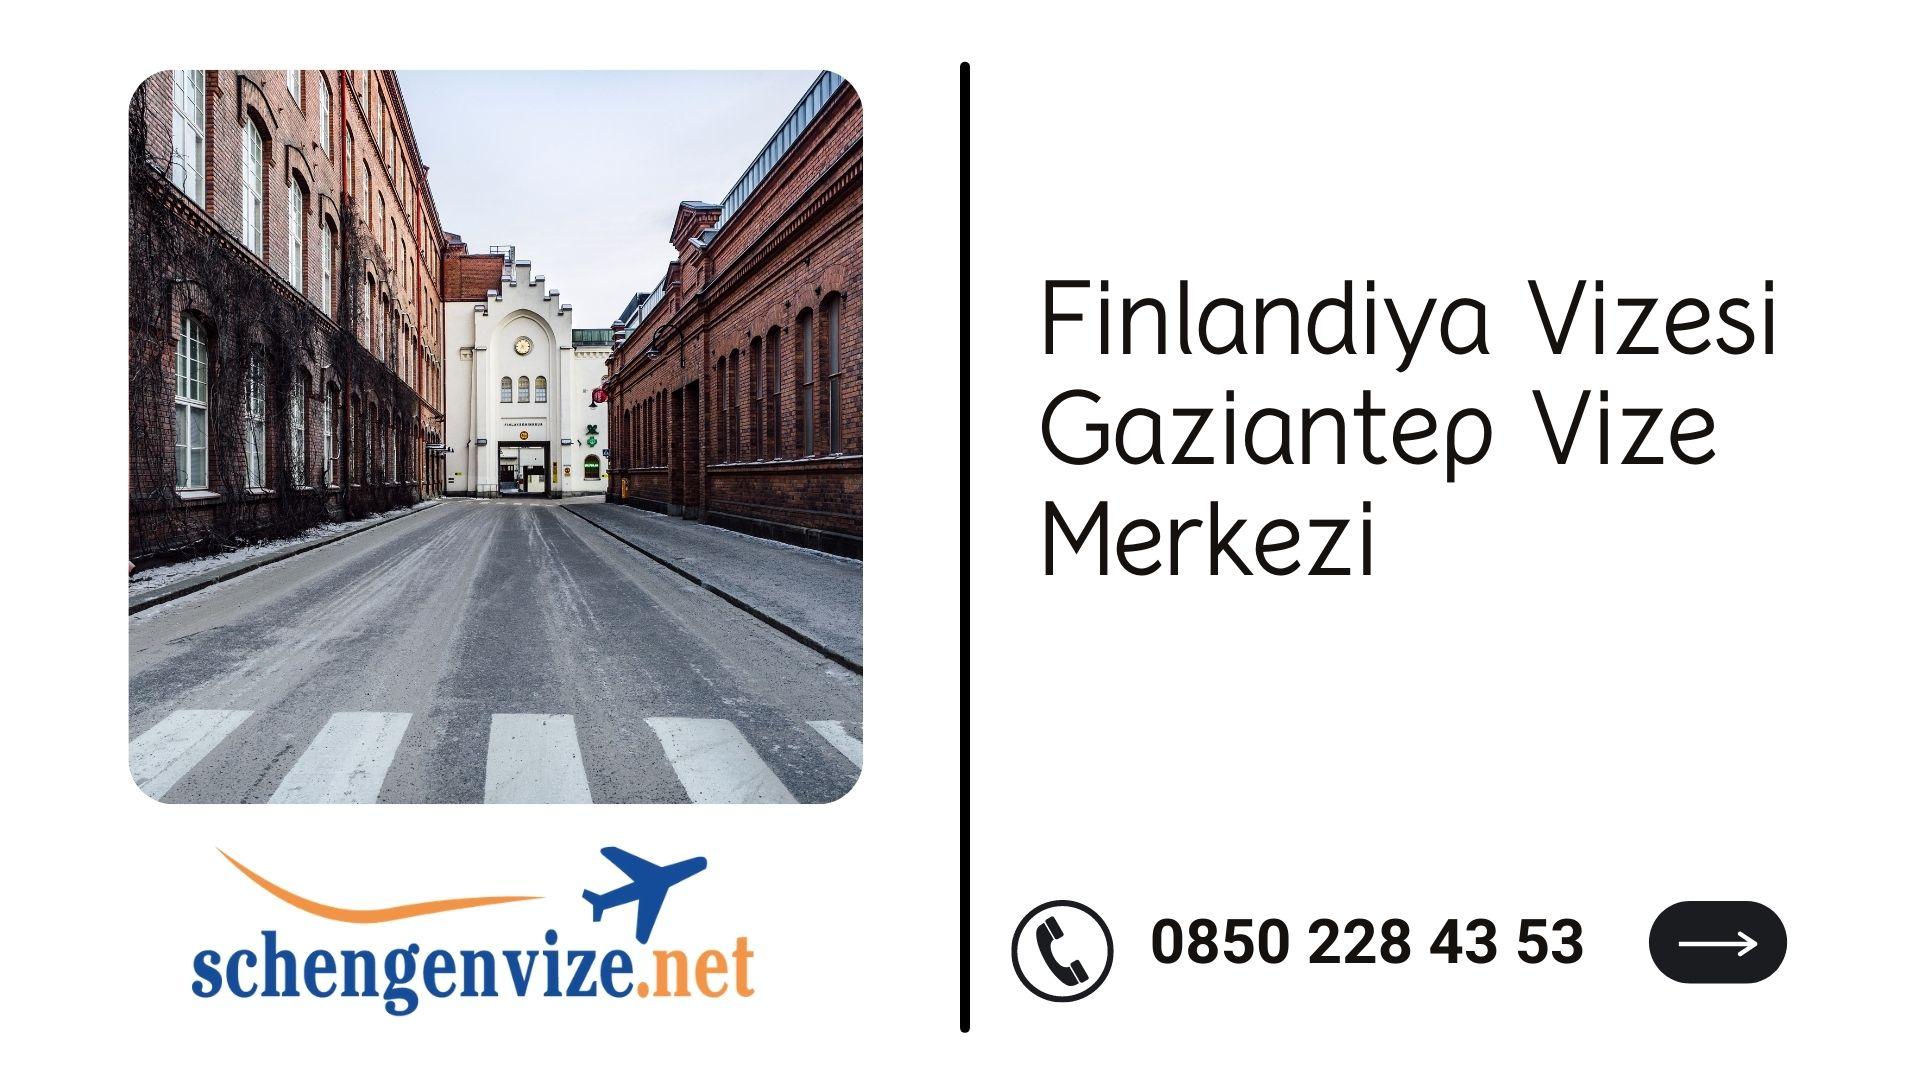 Finlandiya Vizesi Gaziantep Vize Merkezi